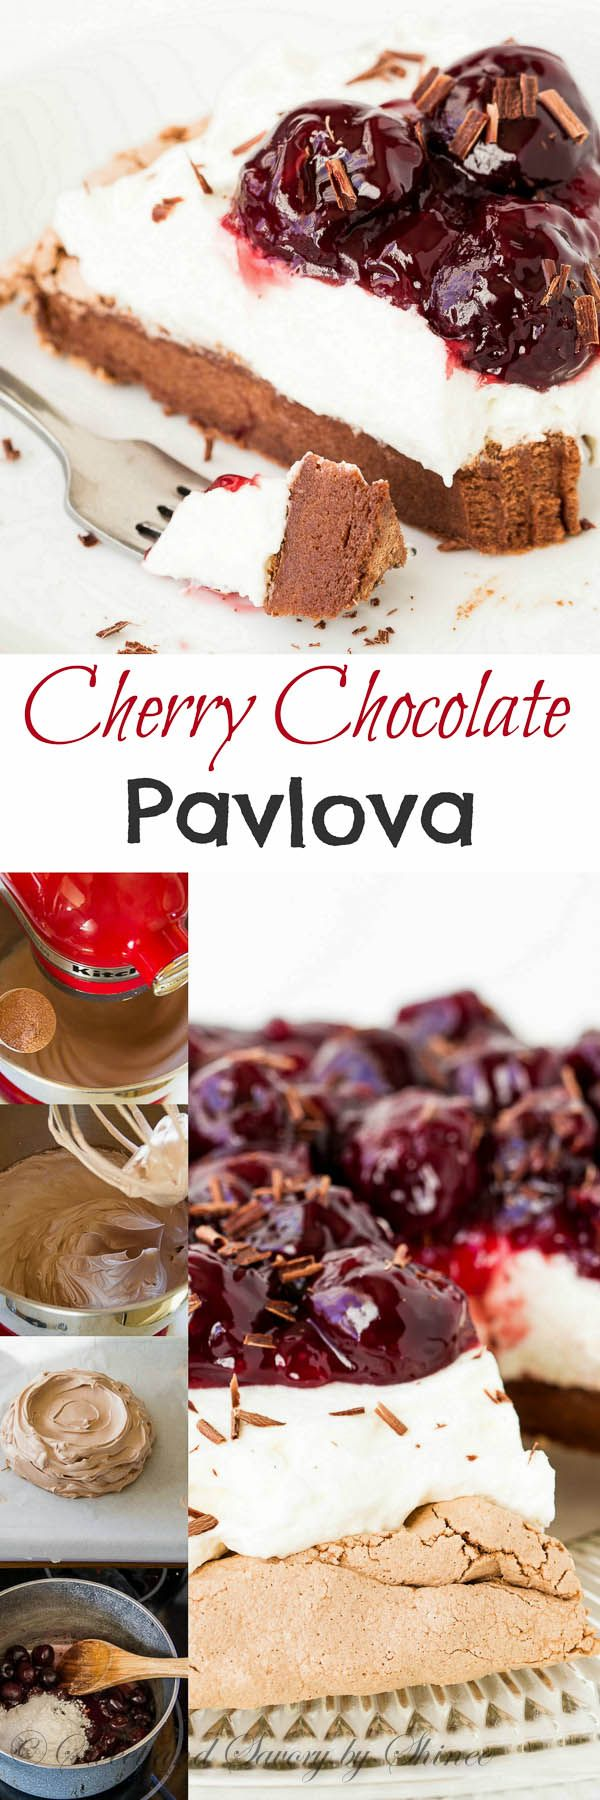 25+ Best Ideas about Pavlova Toppings on Pinterest | Pavlova, Pavlova ...